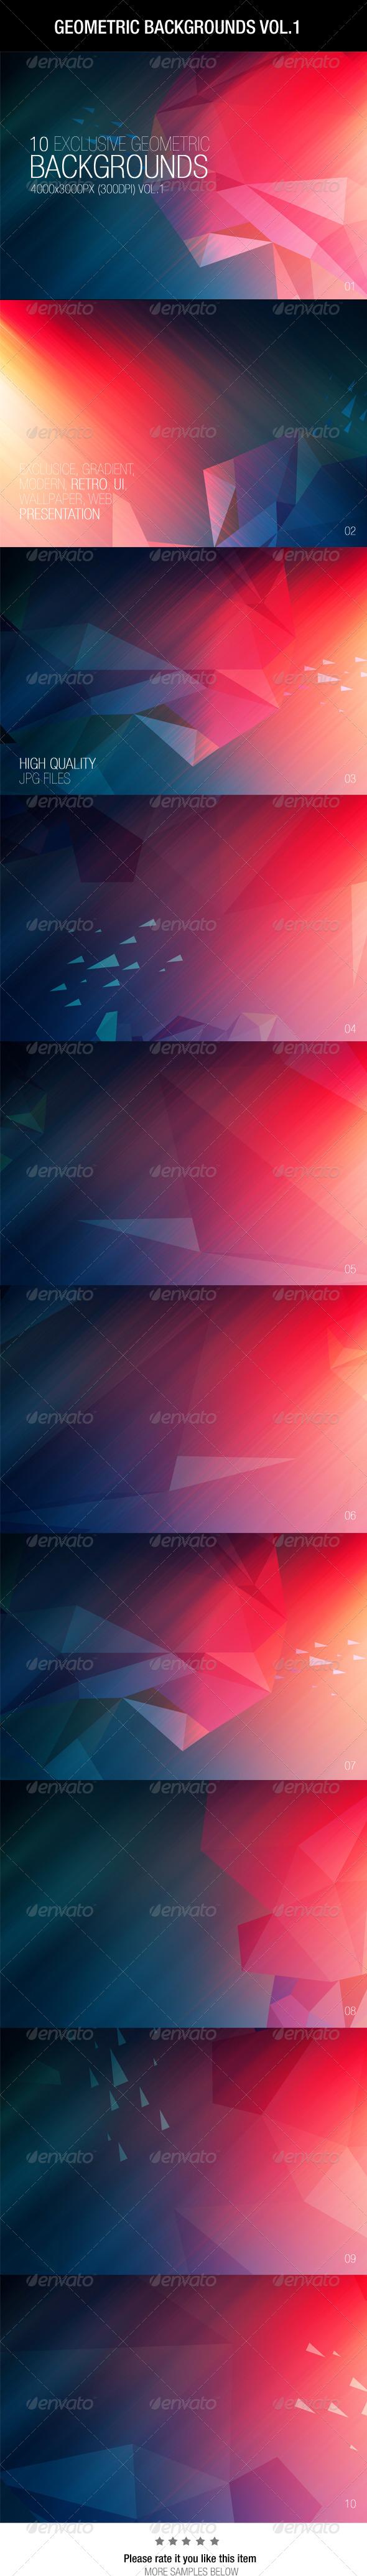 Geometric Backgrounds Vol.1